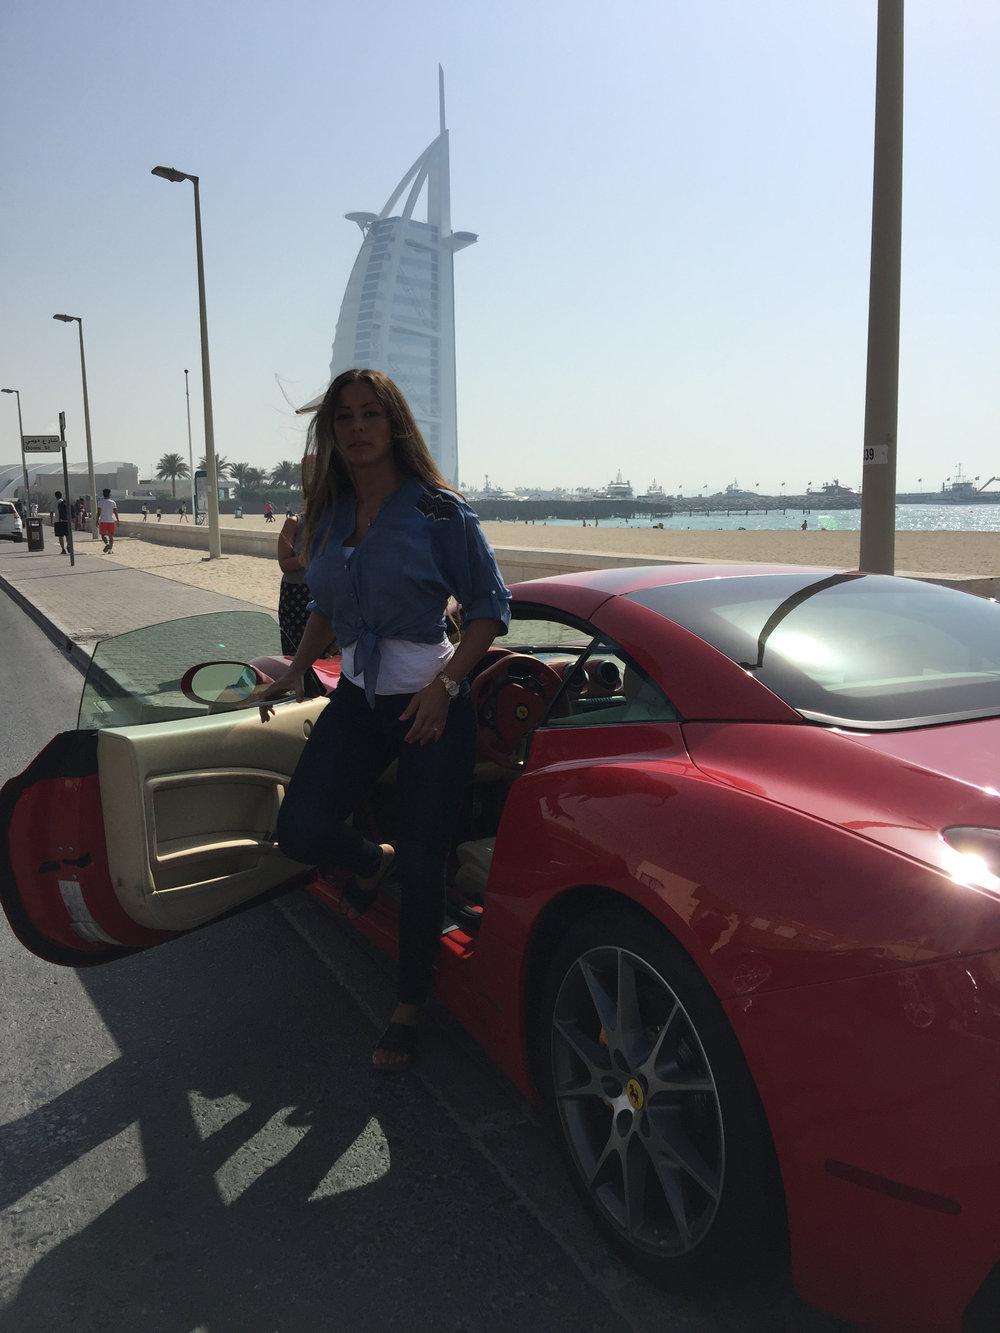 carla in her ferrari dubai burj khalifa room travel blogger influencer vlogger carla maria bruno advantures.jpg